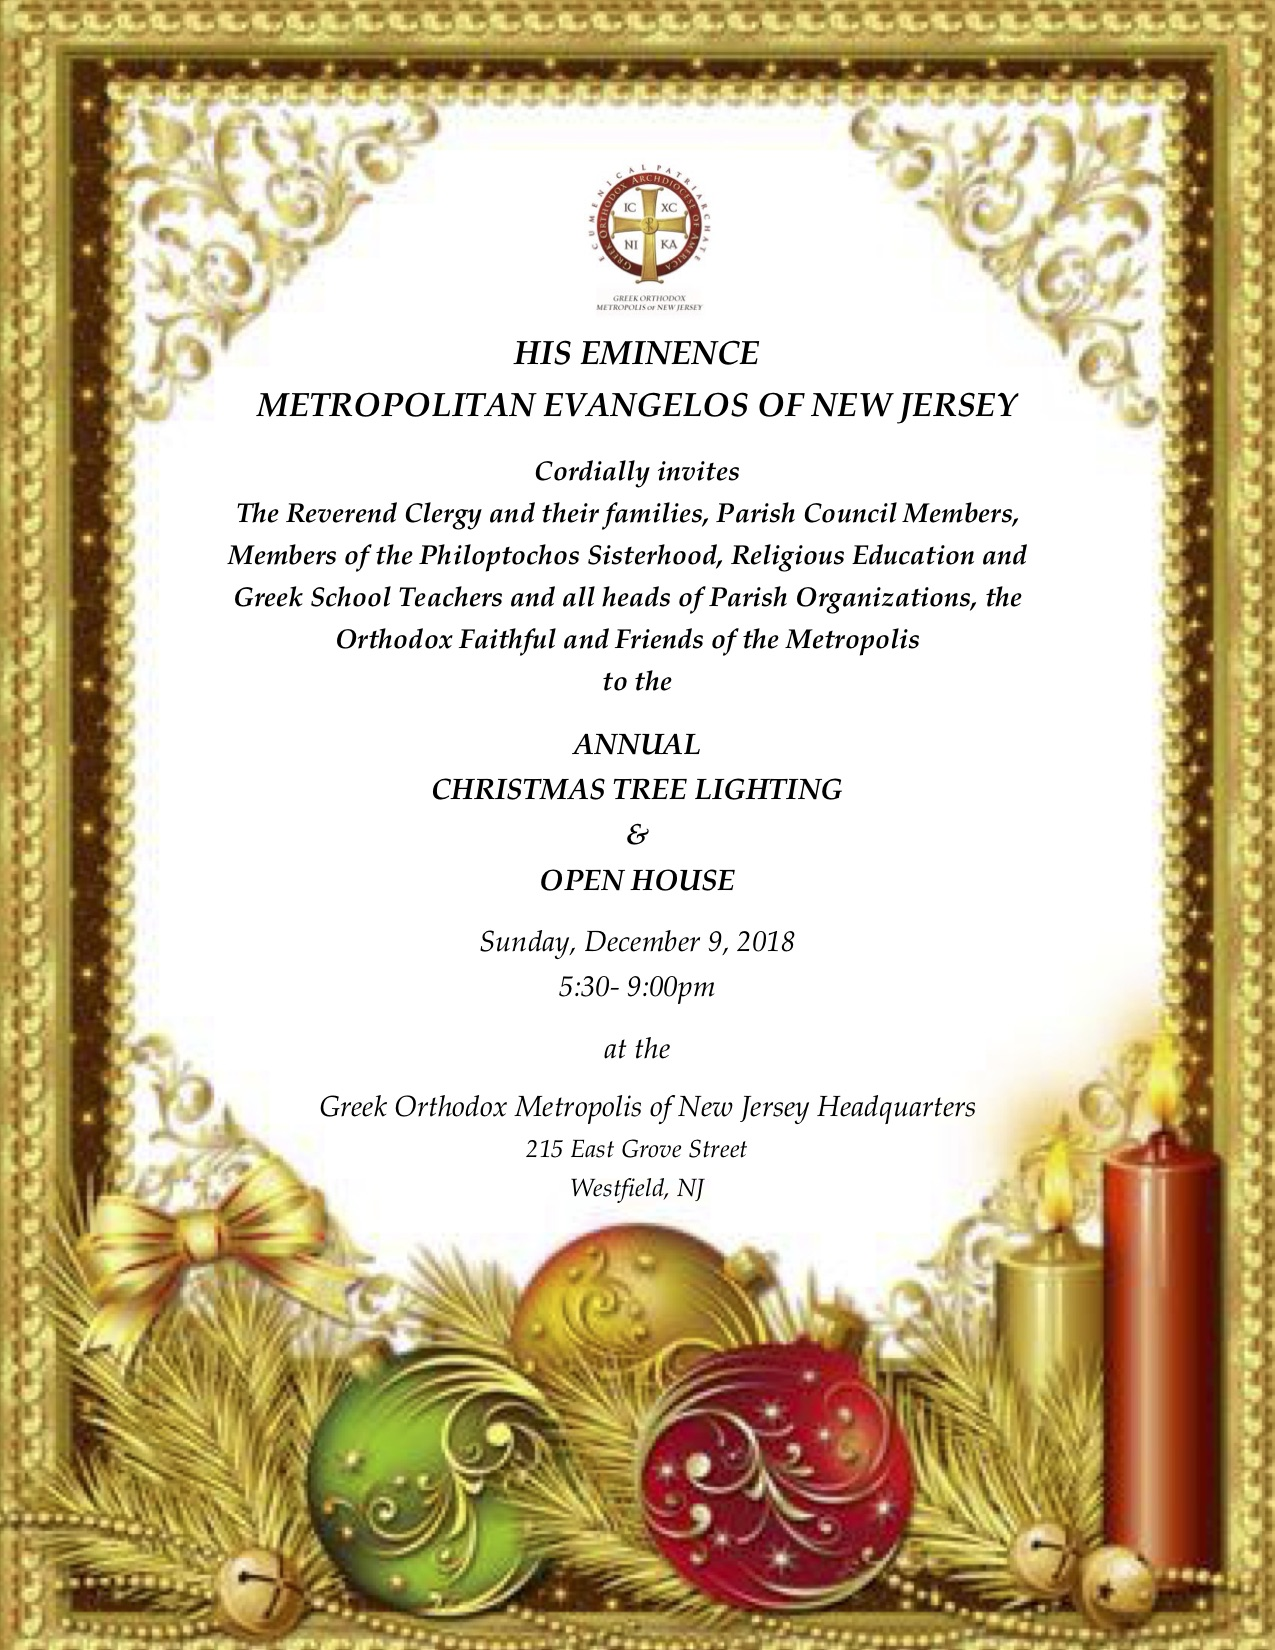 When Is Greek Orthodox Christmas.Gomnj Christmas Open House Dec 9 St Demetrios Greek